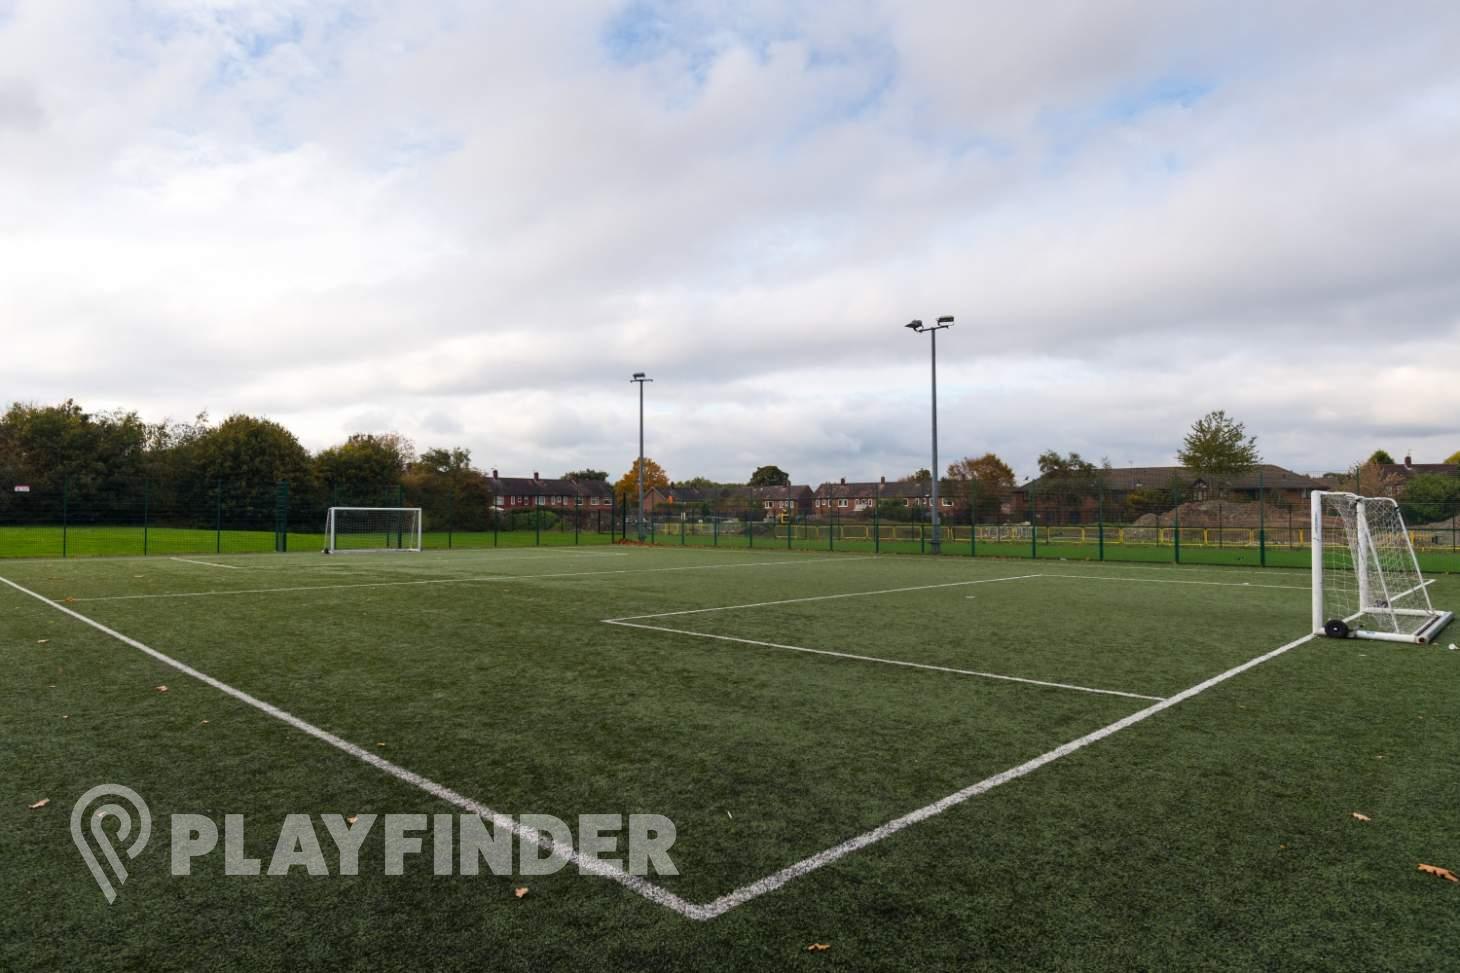 Manchester Enterprise Academy Wythenshawe 5 a side | 3G Astroturf football pitch